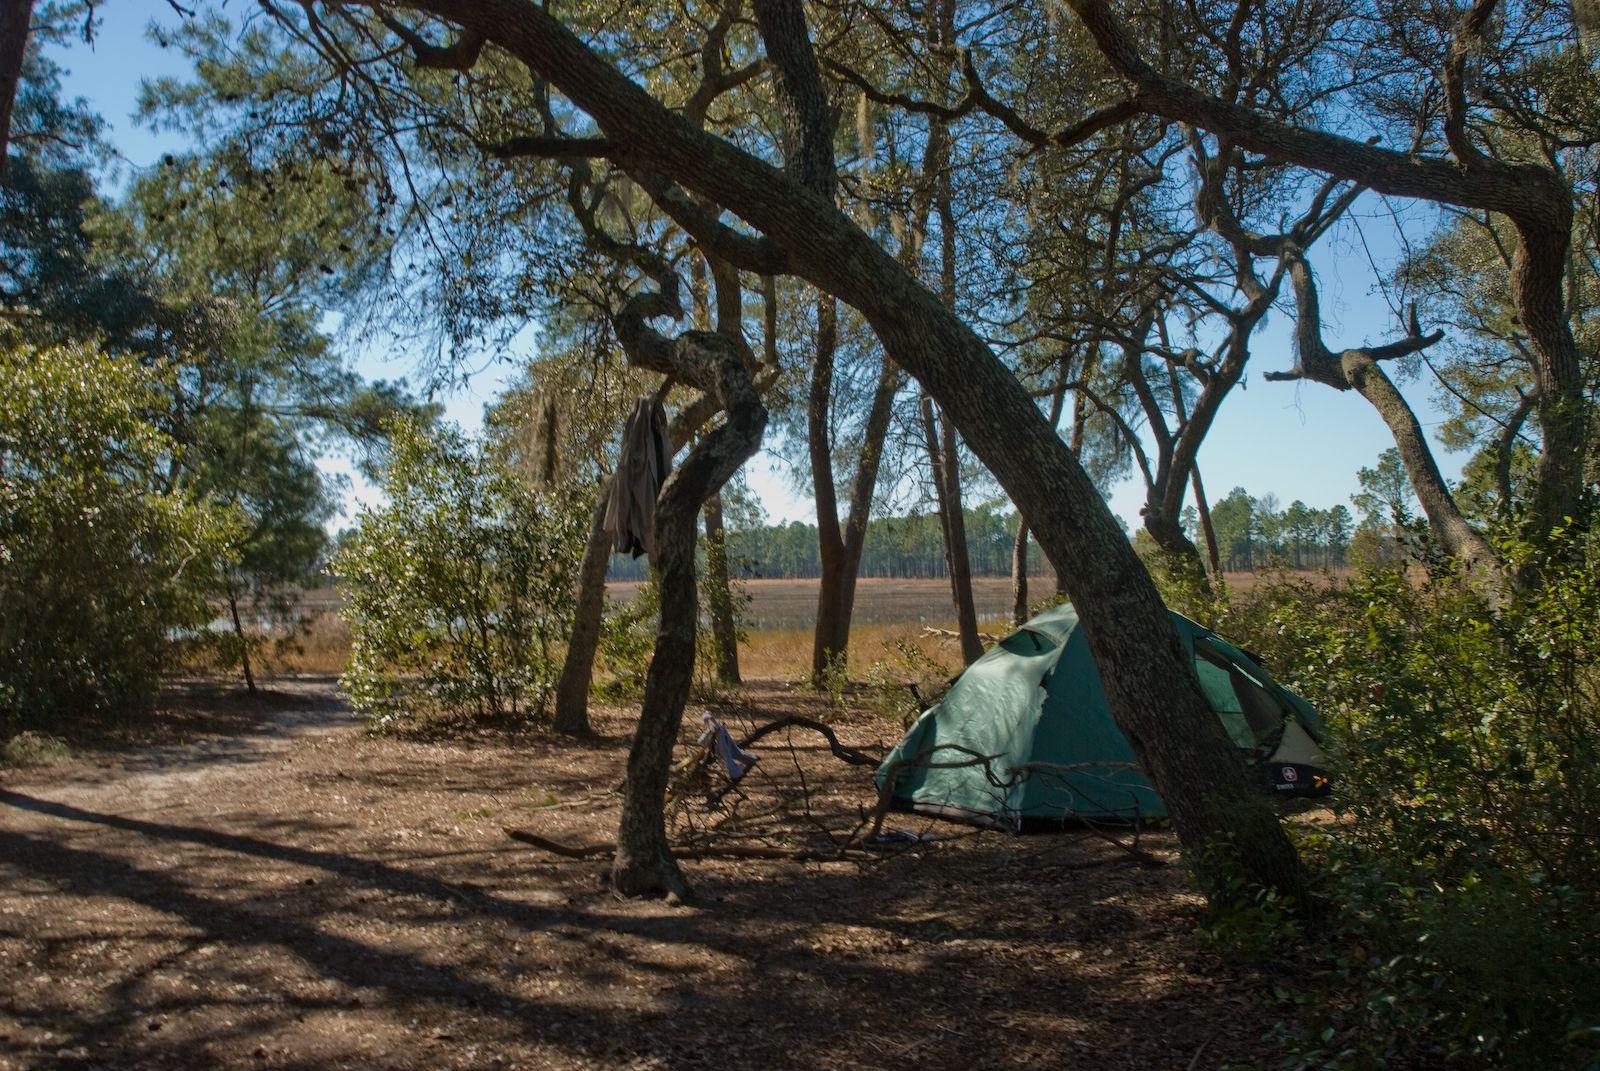 Ozark National Forest Dispersed Camping